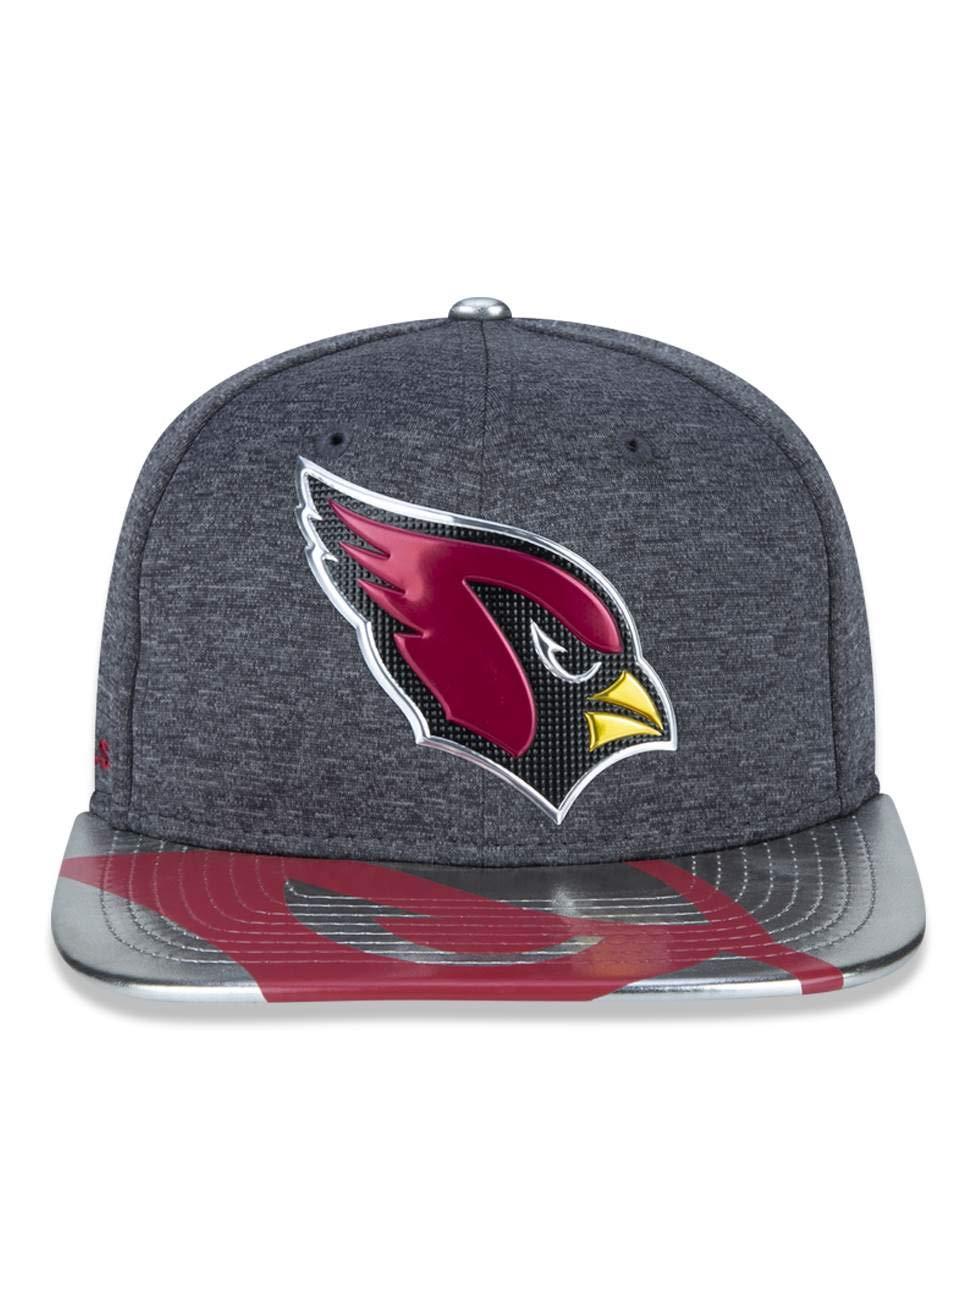 on sale b8297 fa5f6 ... france amazon new era nfl arizona cardinals 2017 draft spotlight 9fifty  snapback cap one size graphite